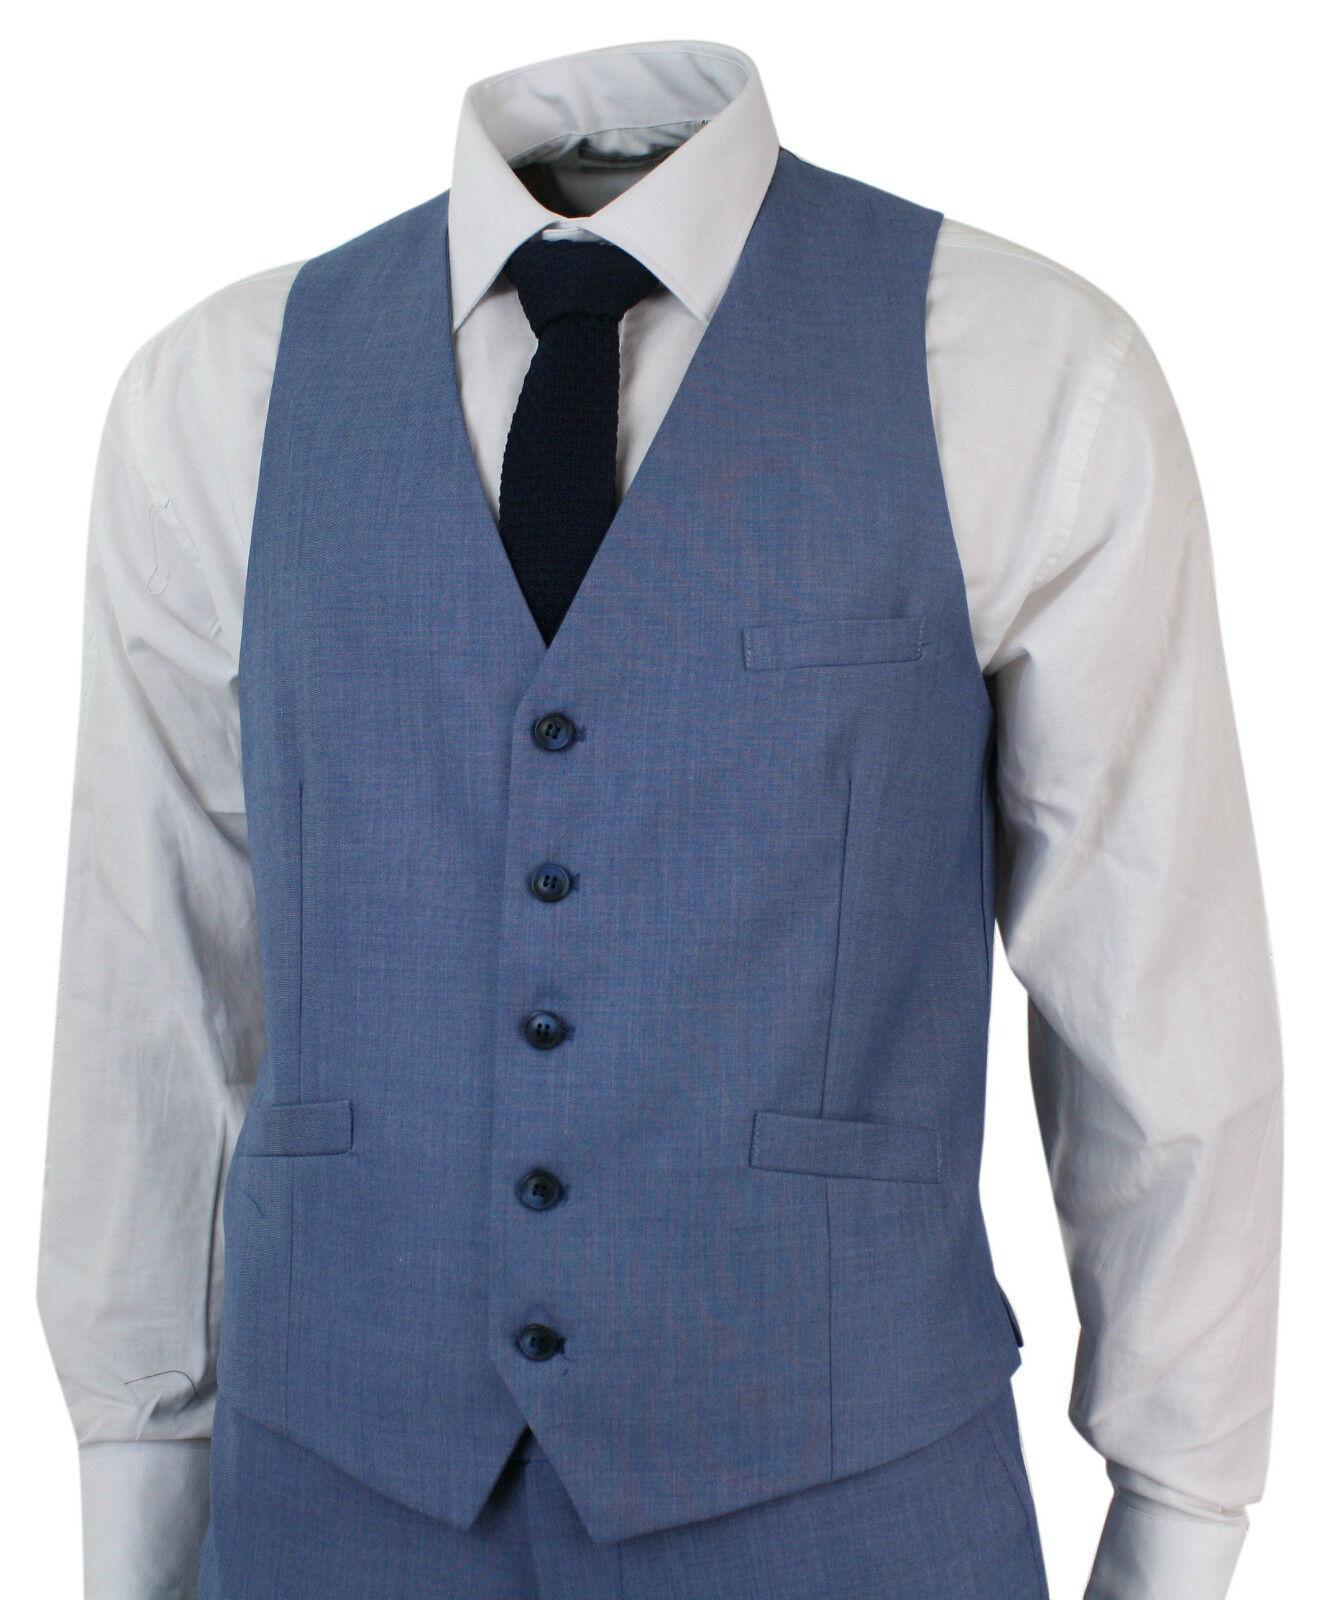 Mens Light Sky Blue 3 Piece Smart Formal Wedding Party Suit Tailored ...